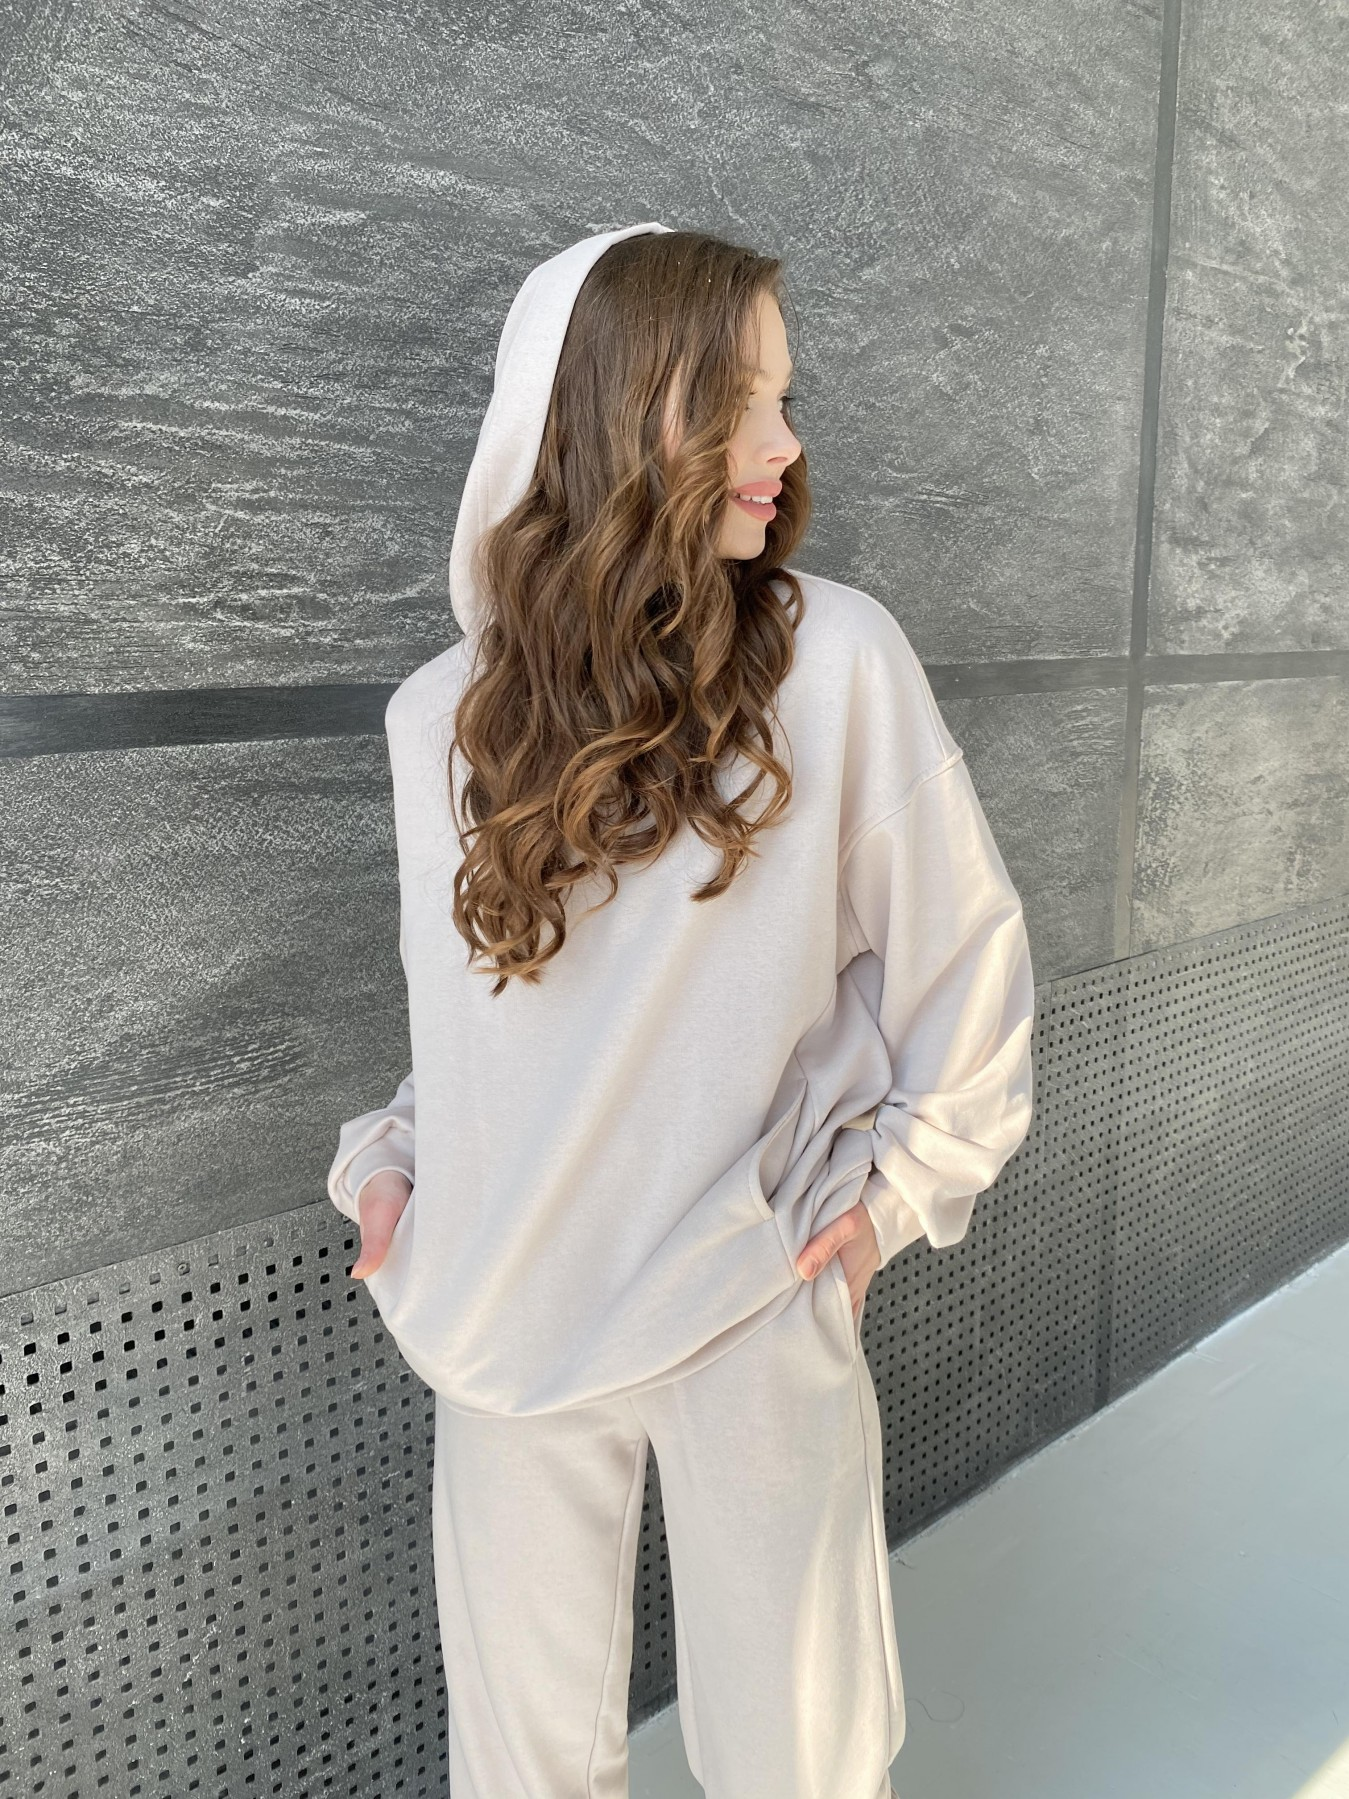 Марион костюм из 3х нитки 10581 АРТ. 46936 Цвет: Бежевый - фото 7, интернет магазин tm-modus.ru